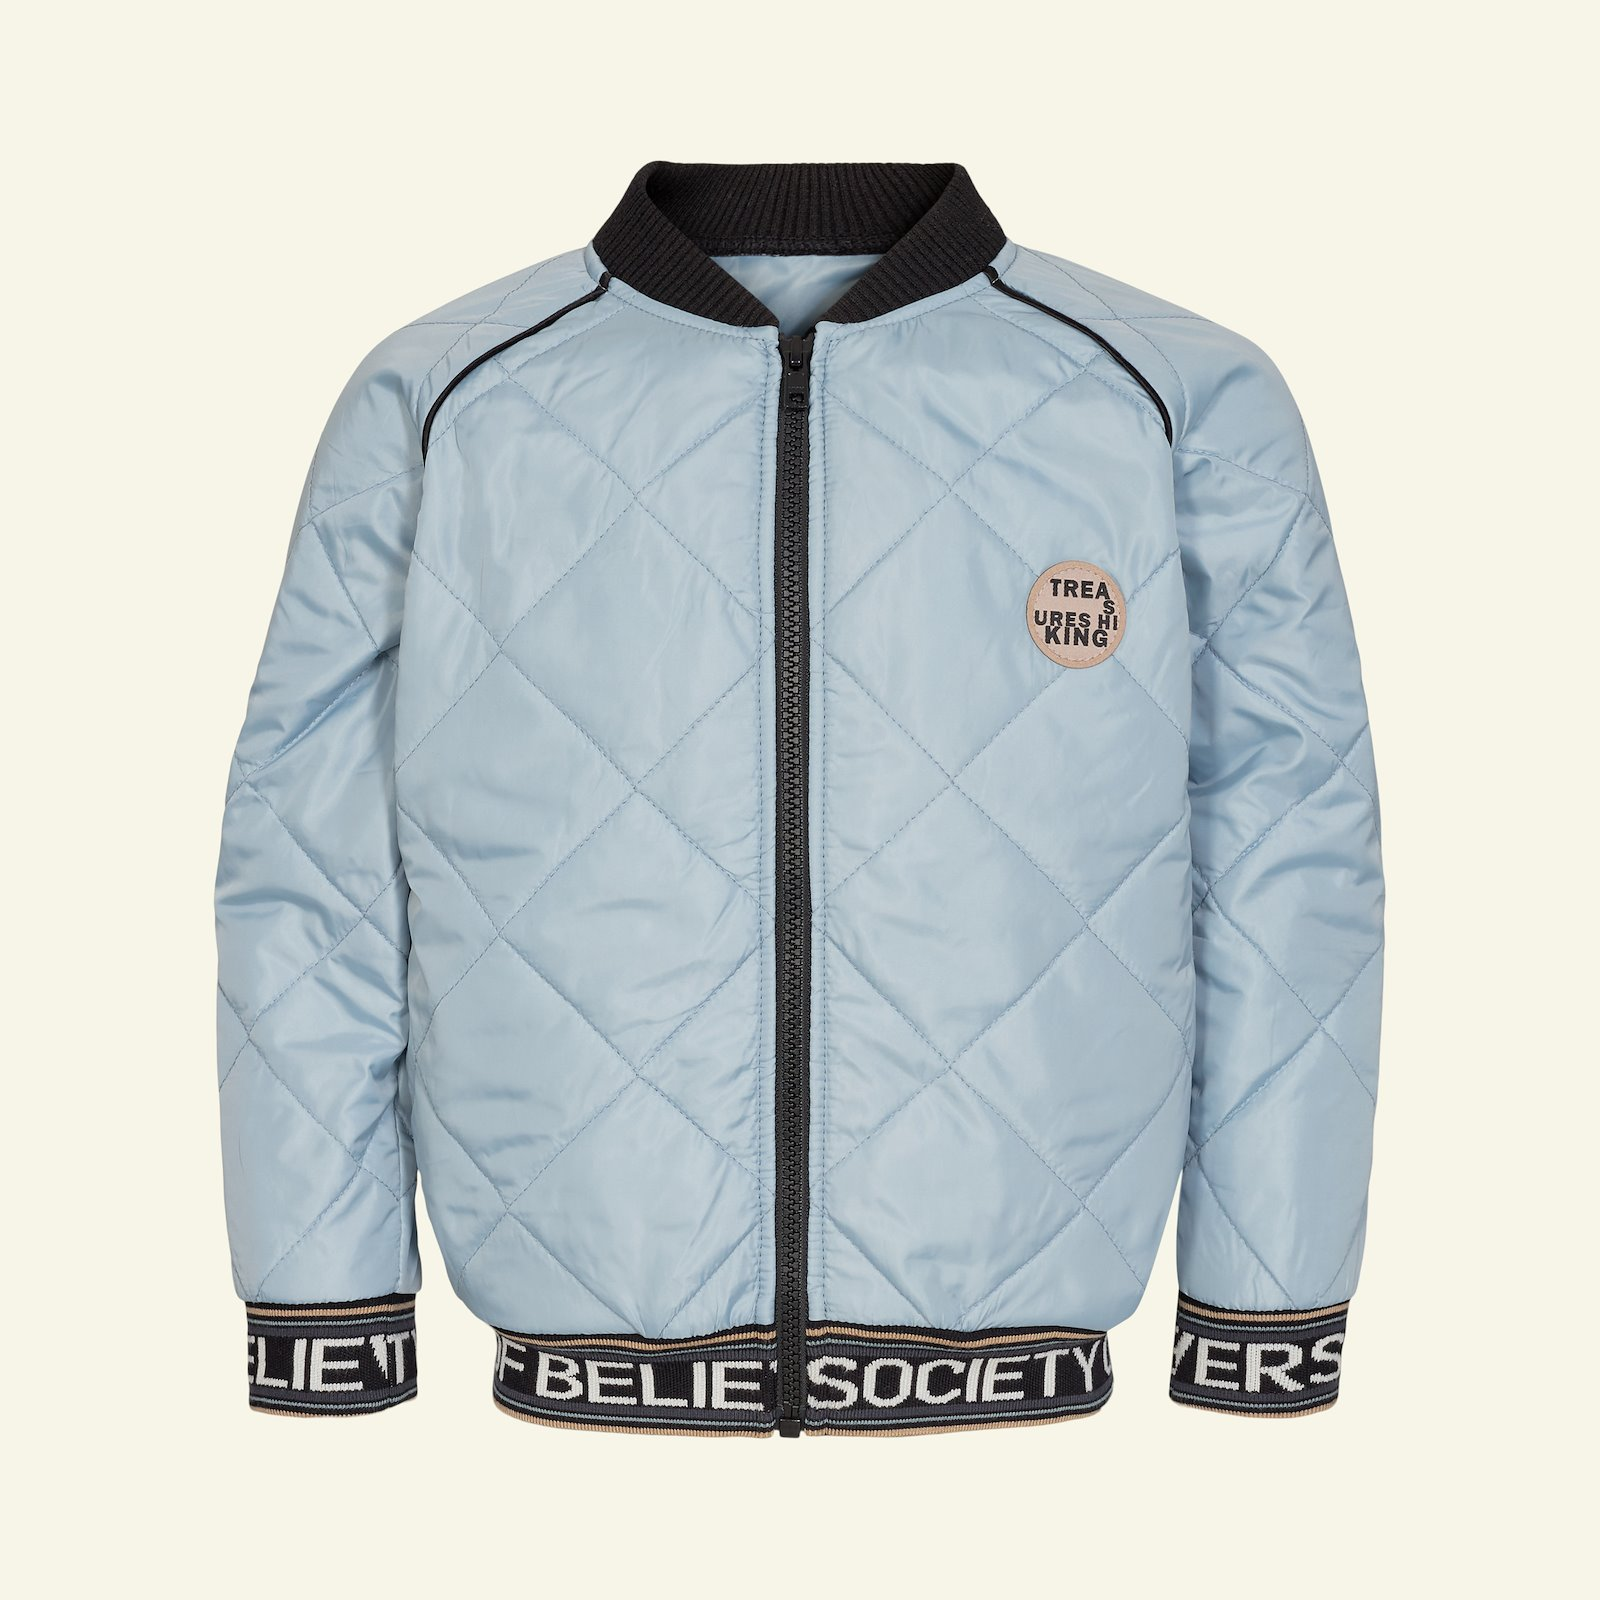 Bomber jacket, 122/7y p64017_920225_3509089_72043_26519_sskit